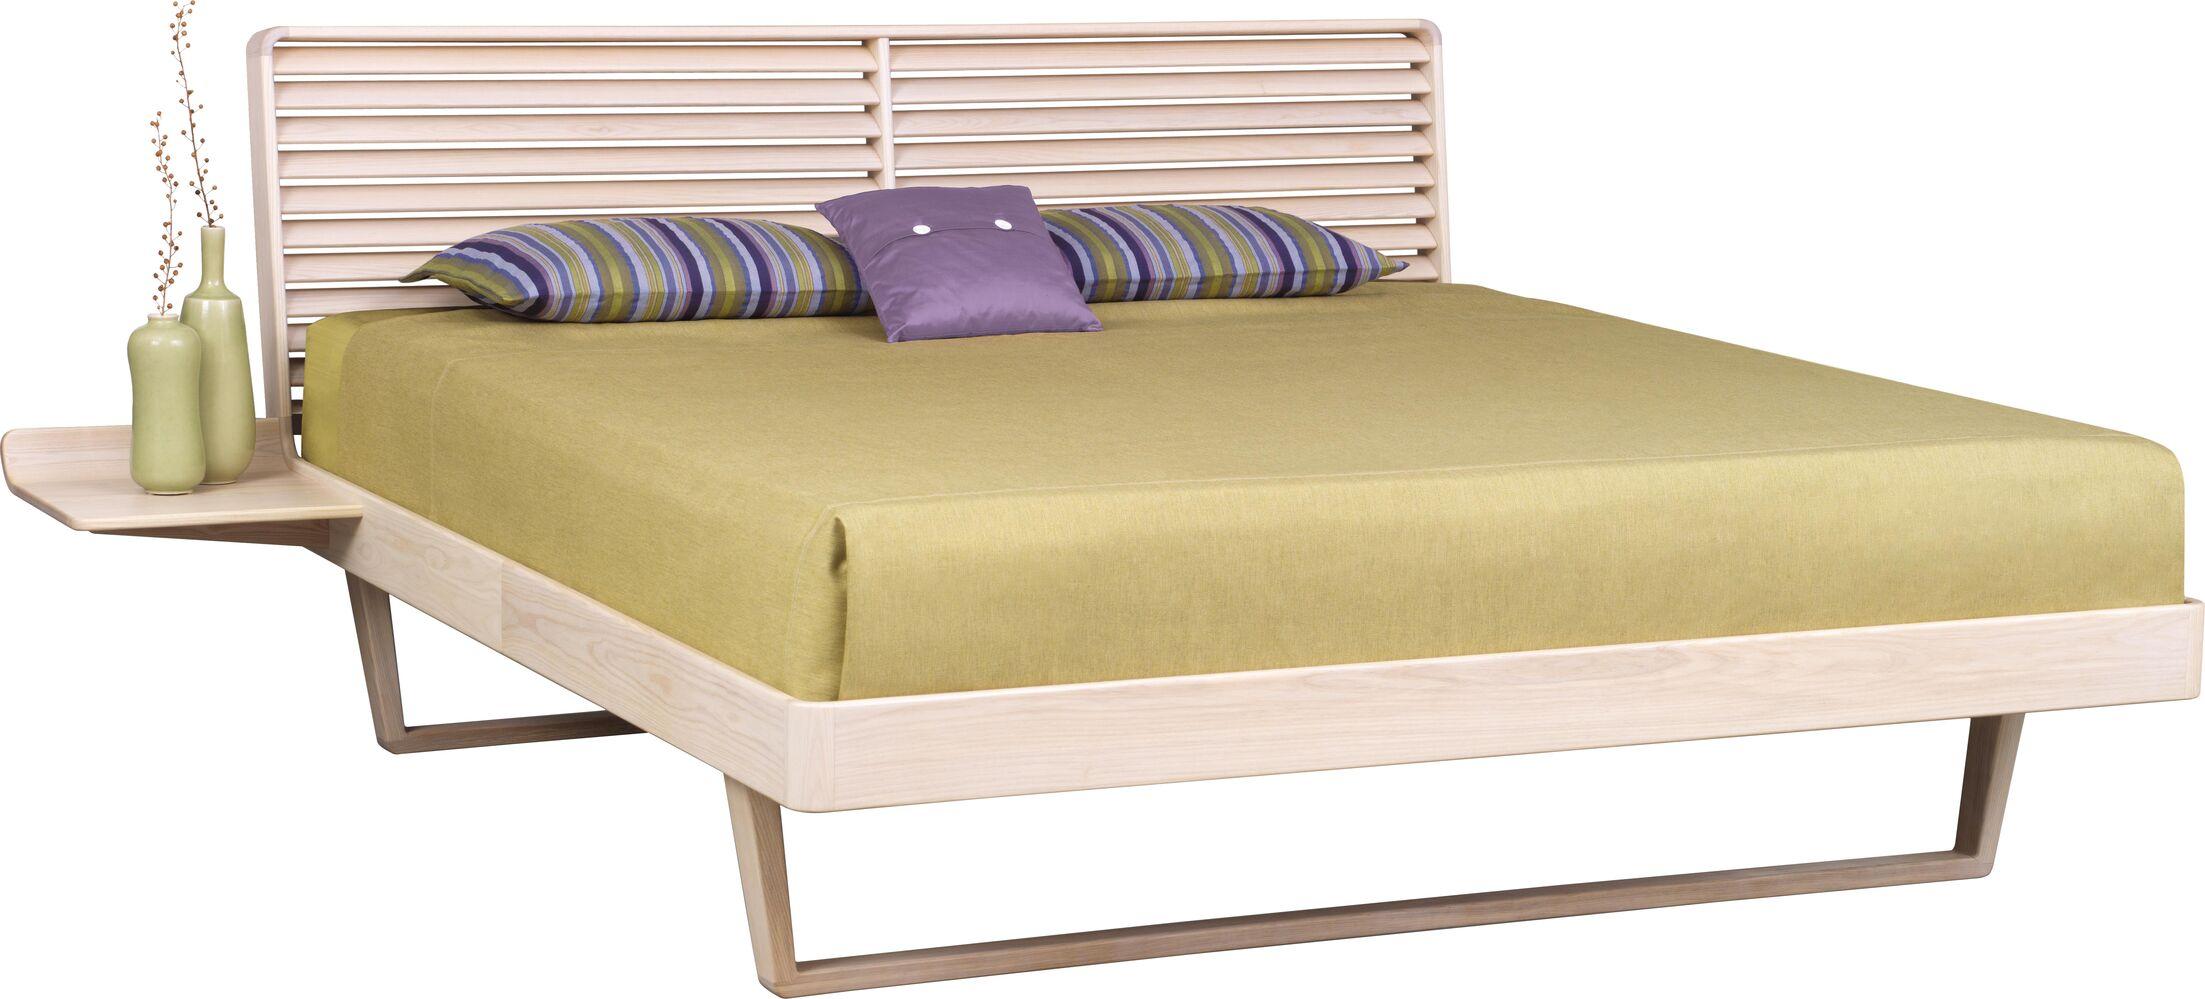 Contour Platform Bed Color: Weathered Ash, Size: Queen